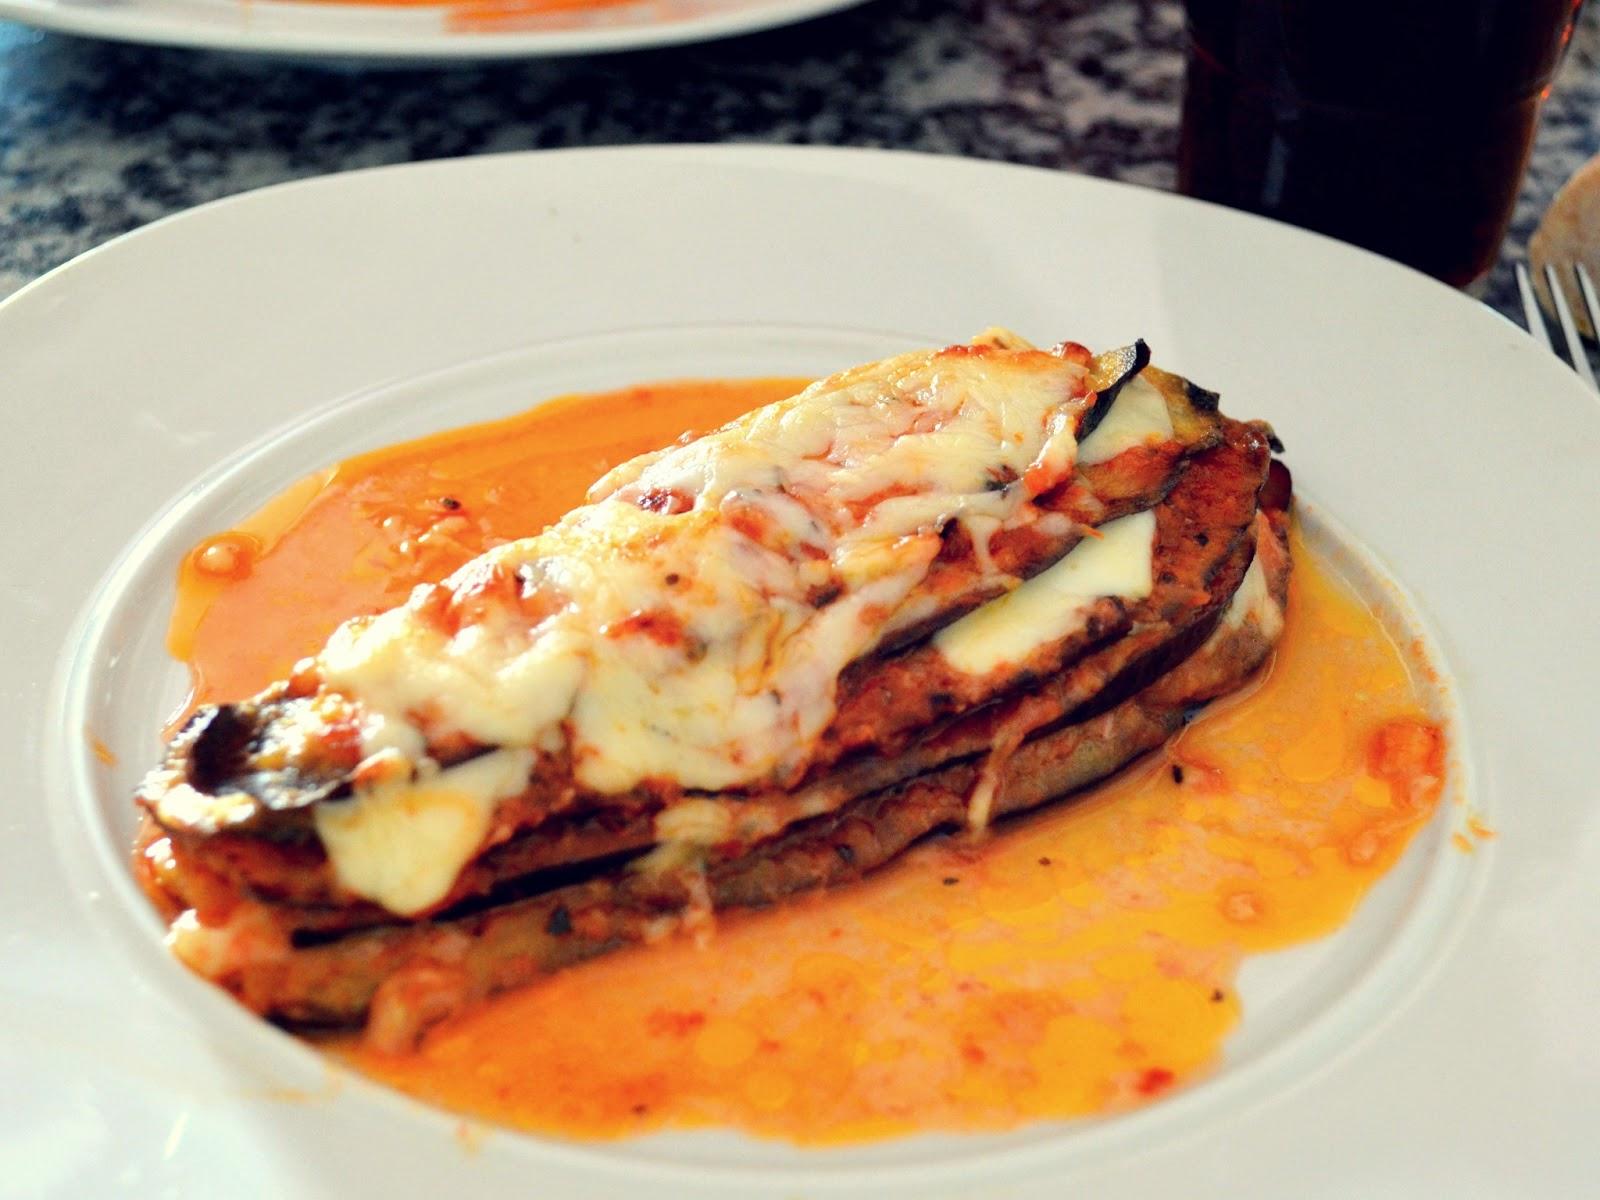 Berenjenas gratinadas con mozzarella mvesblog - Berenjenas con mozzarella ...